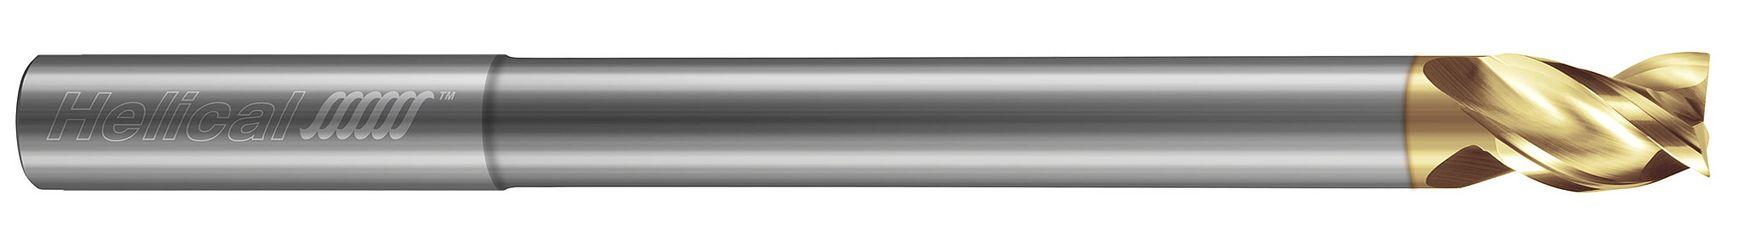 tool-details-46391